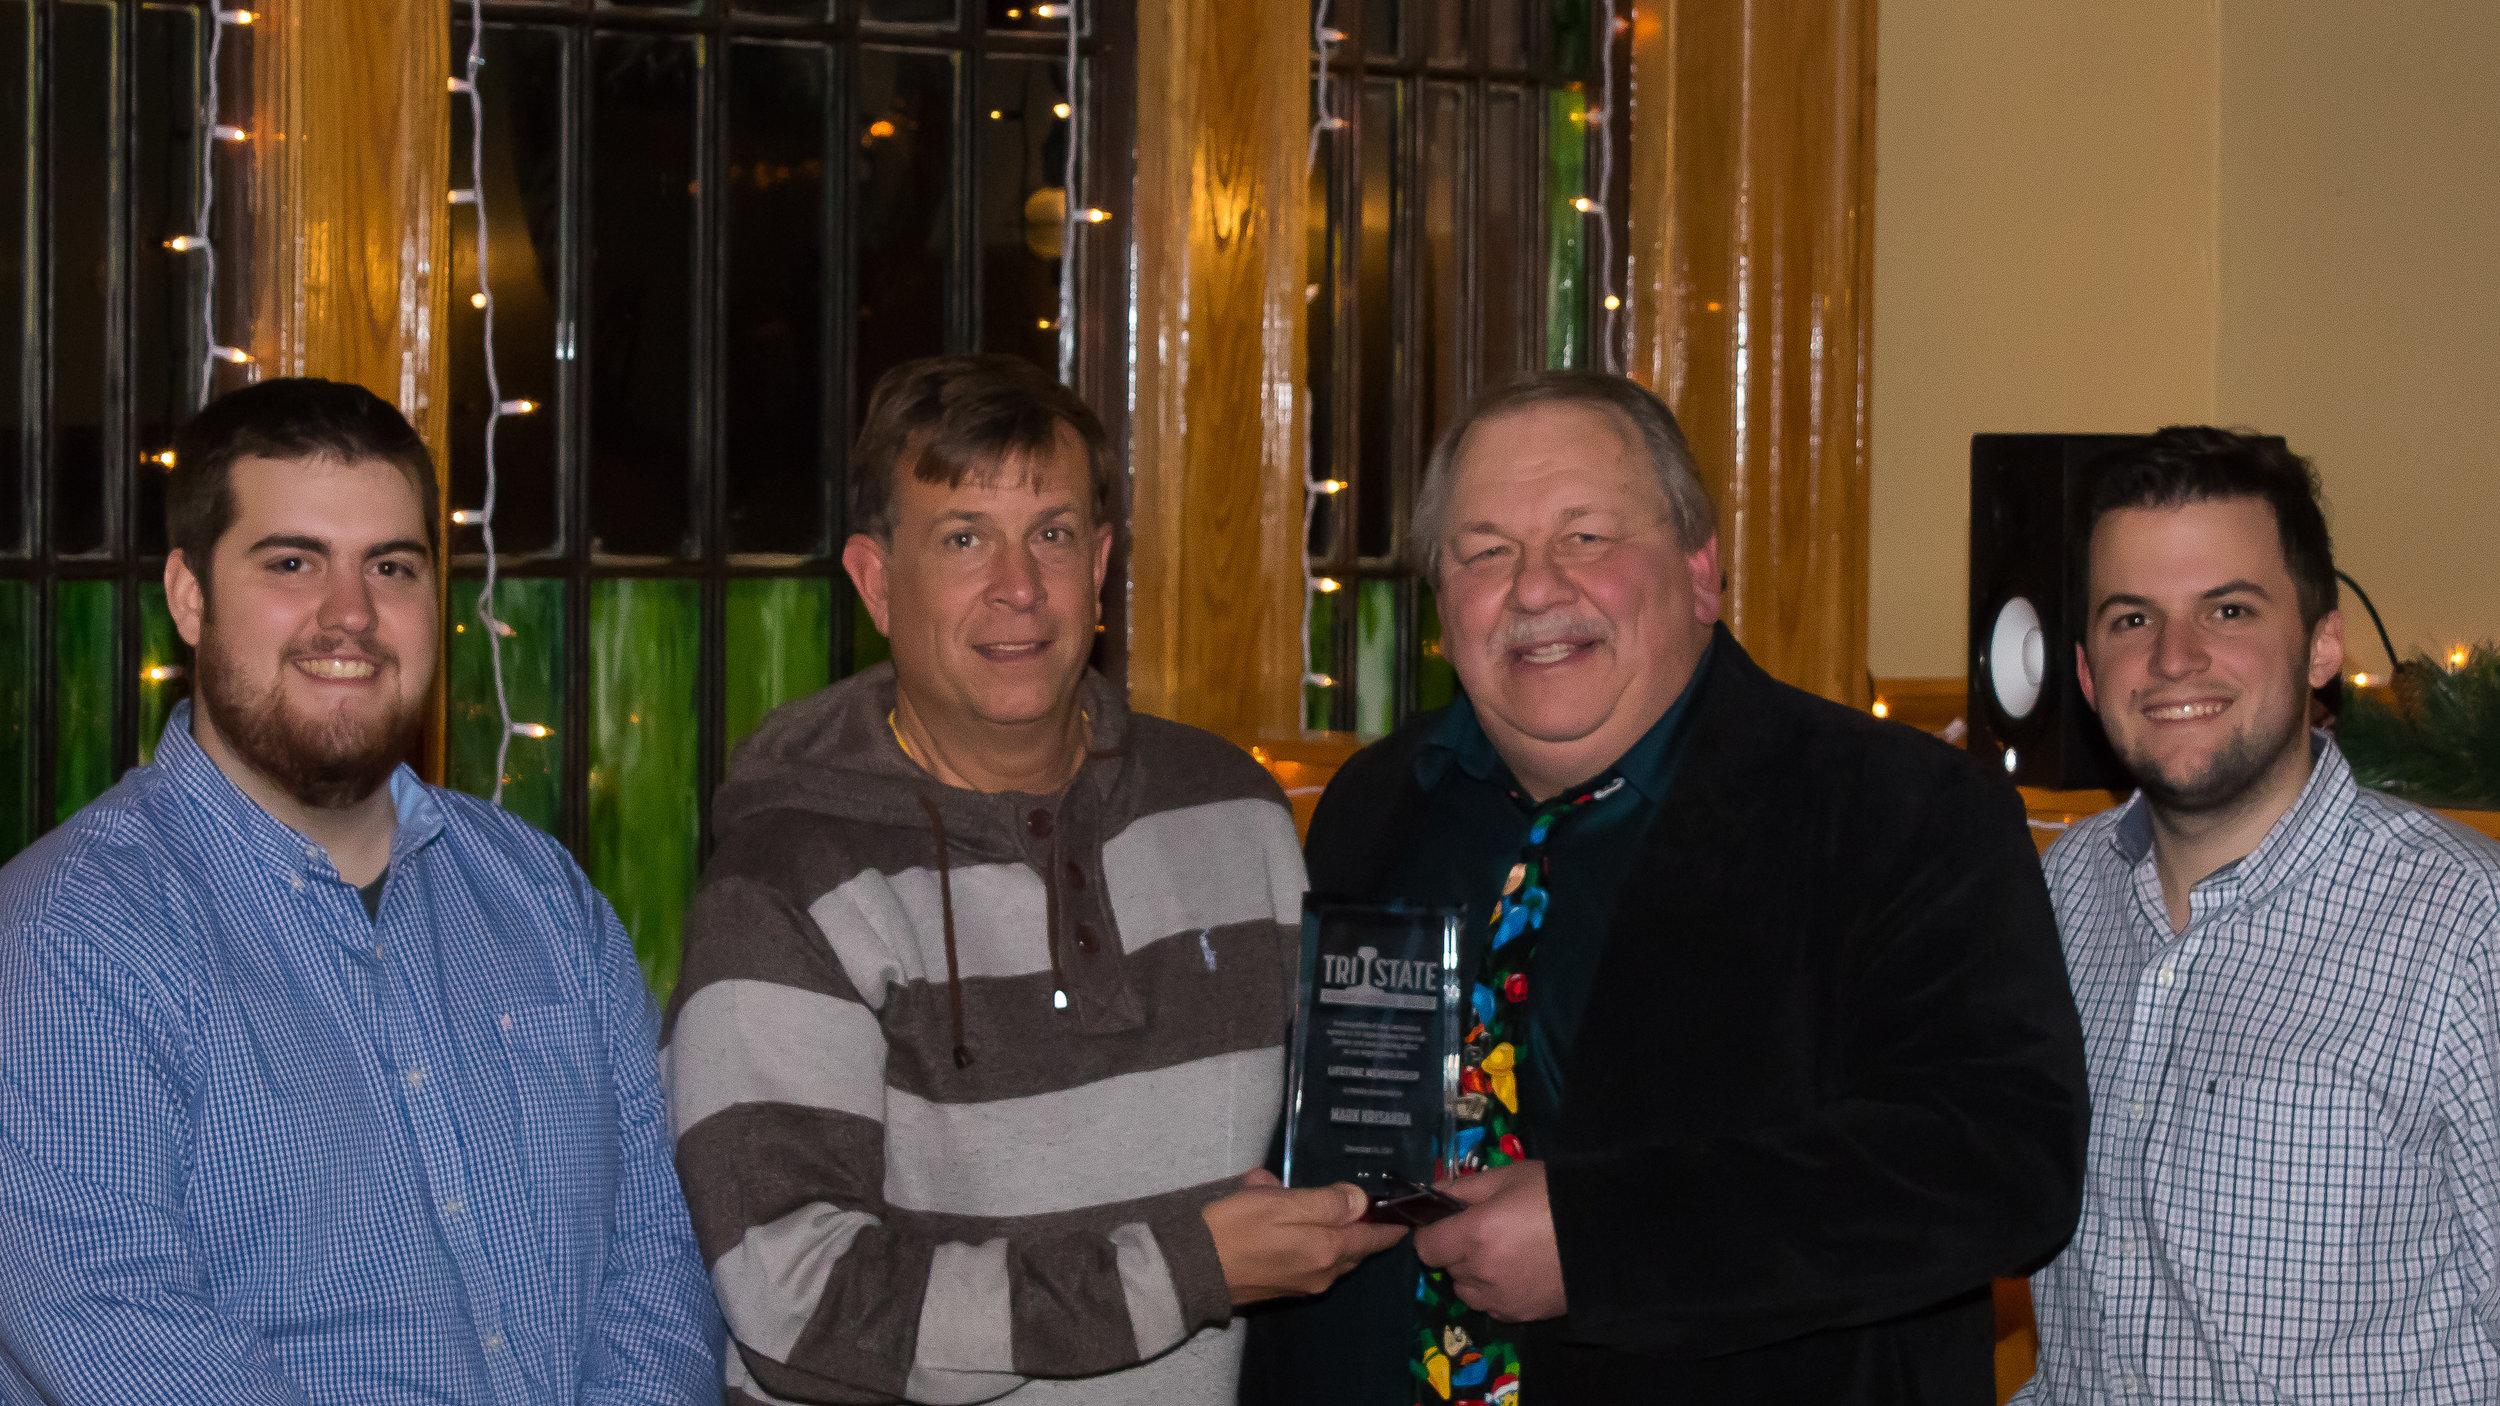 Member Mark Krisanda receives his Lifetime Membership award. From Left to right, Vice President Kevin Phalon, Mark Krisanda, President Michael Del Vecchio, and Treasurer Richard King.